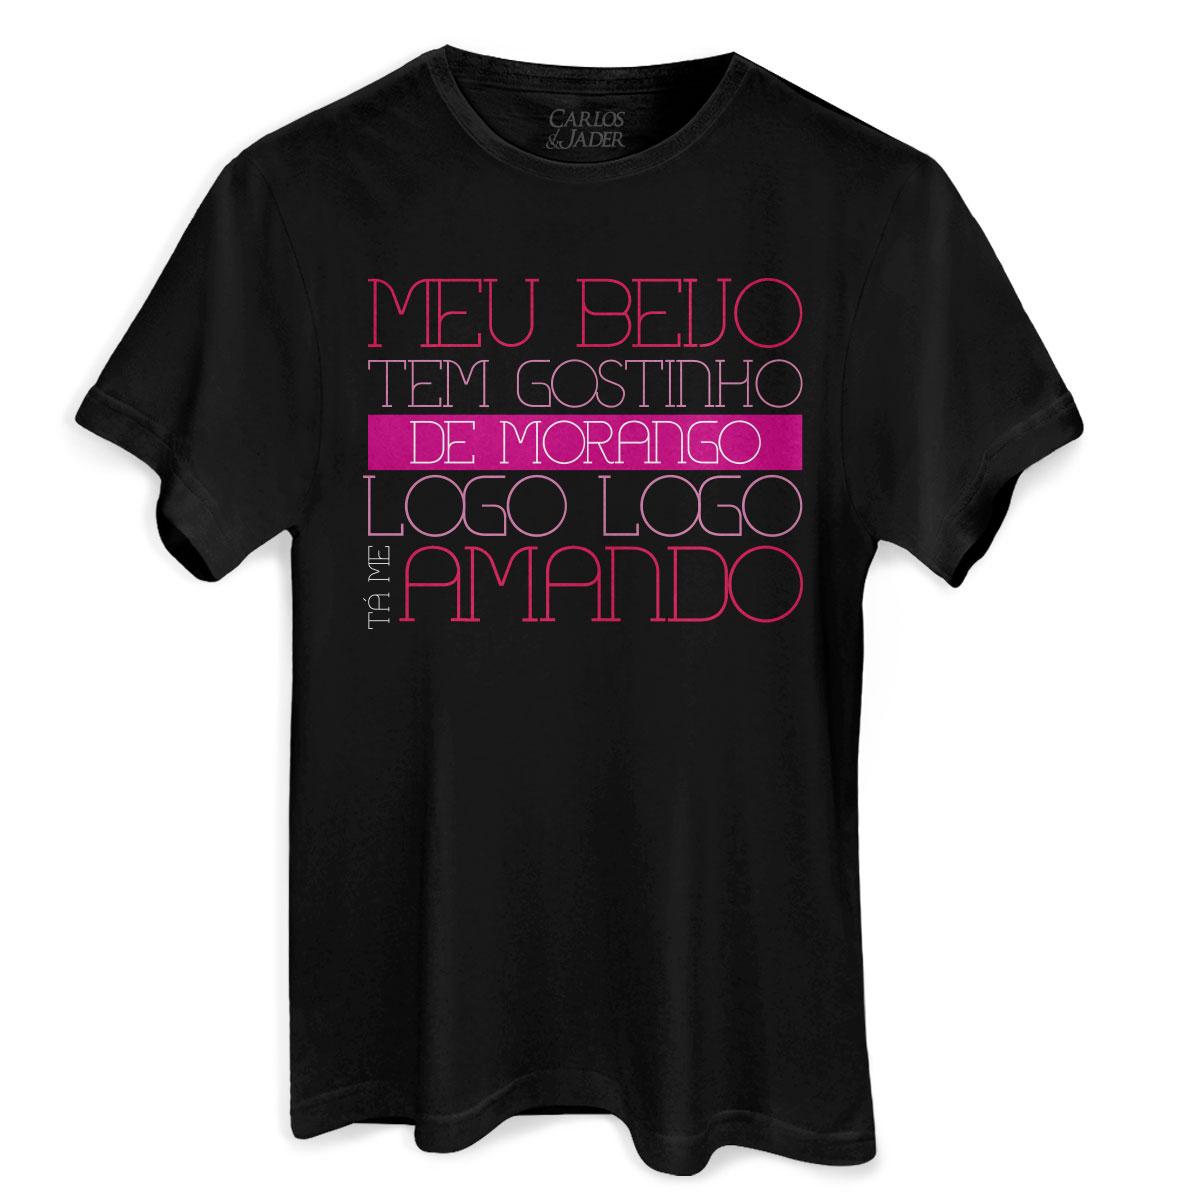 Camiseta Masculina Carlos & Jader Puxo Pela M�o e Beijo